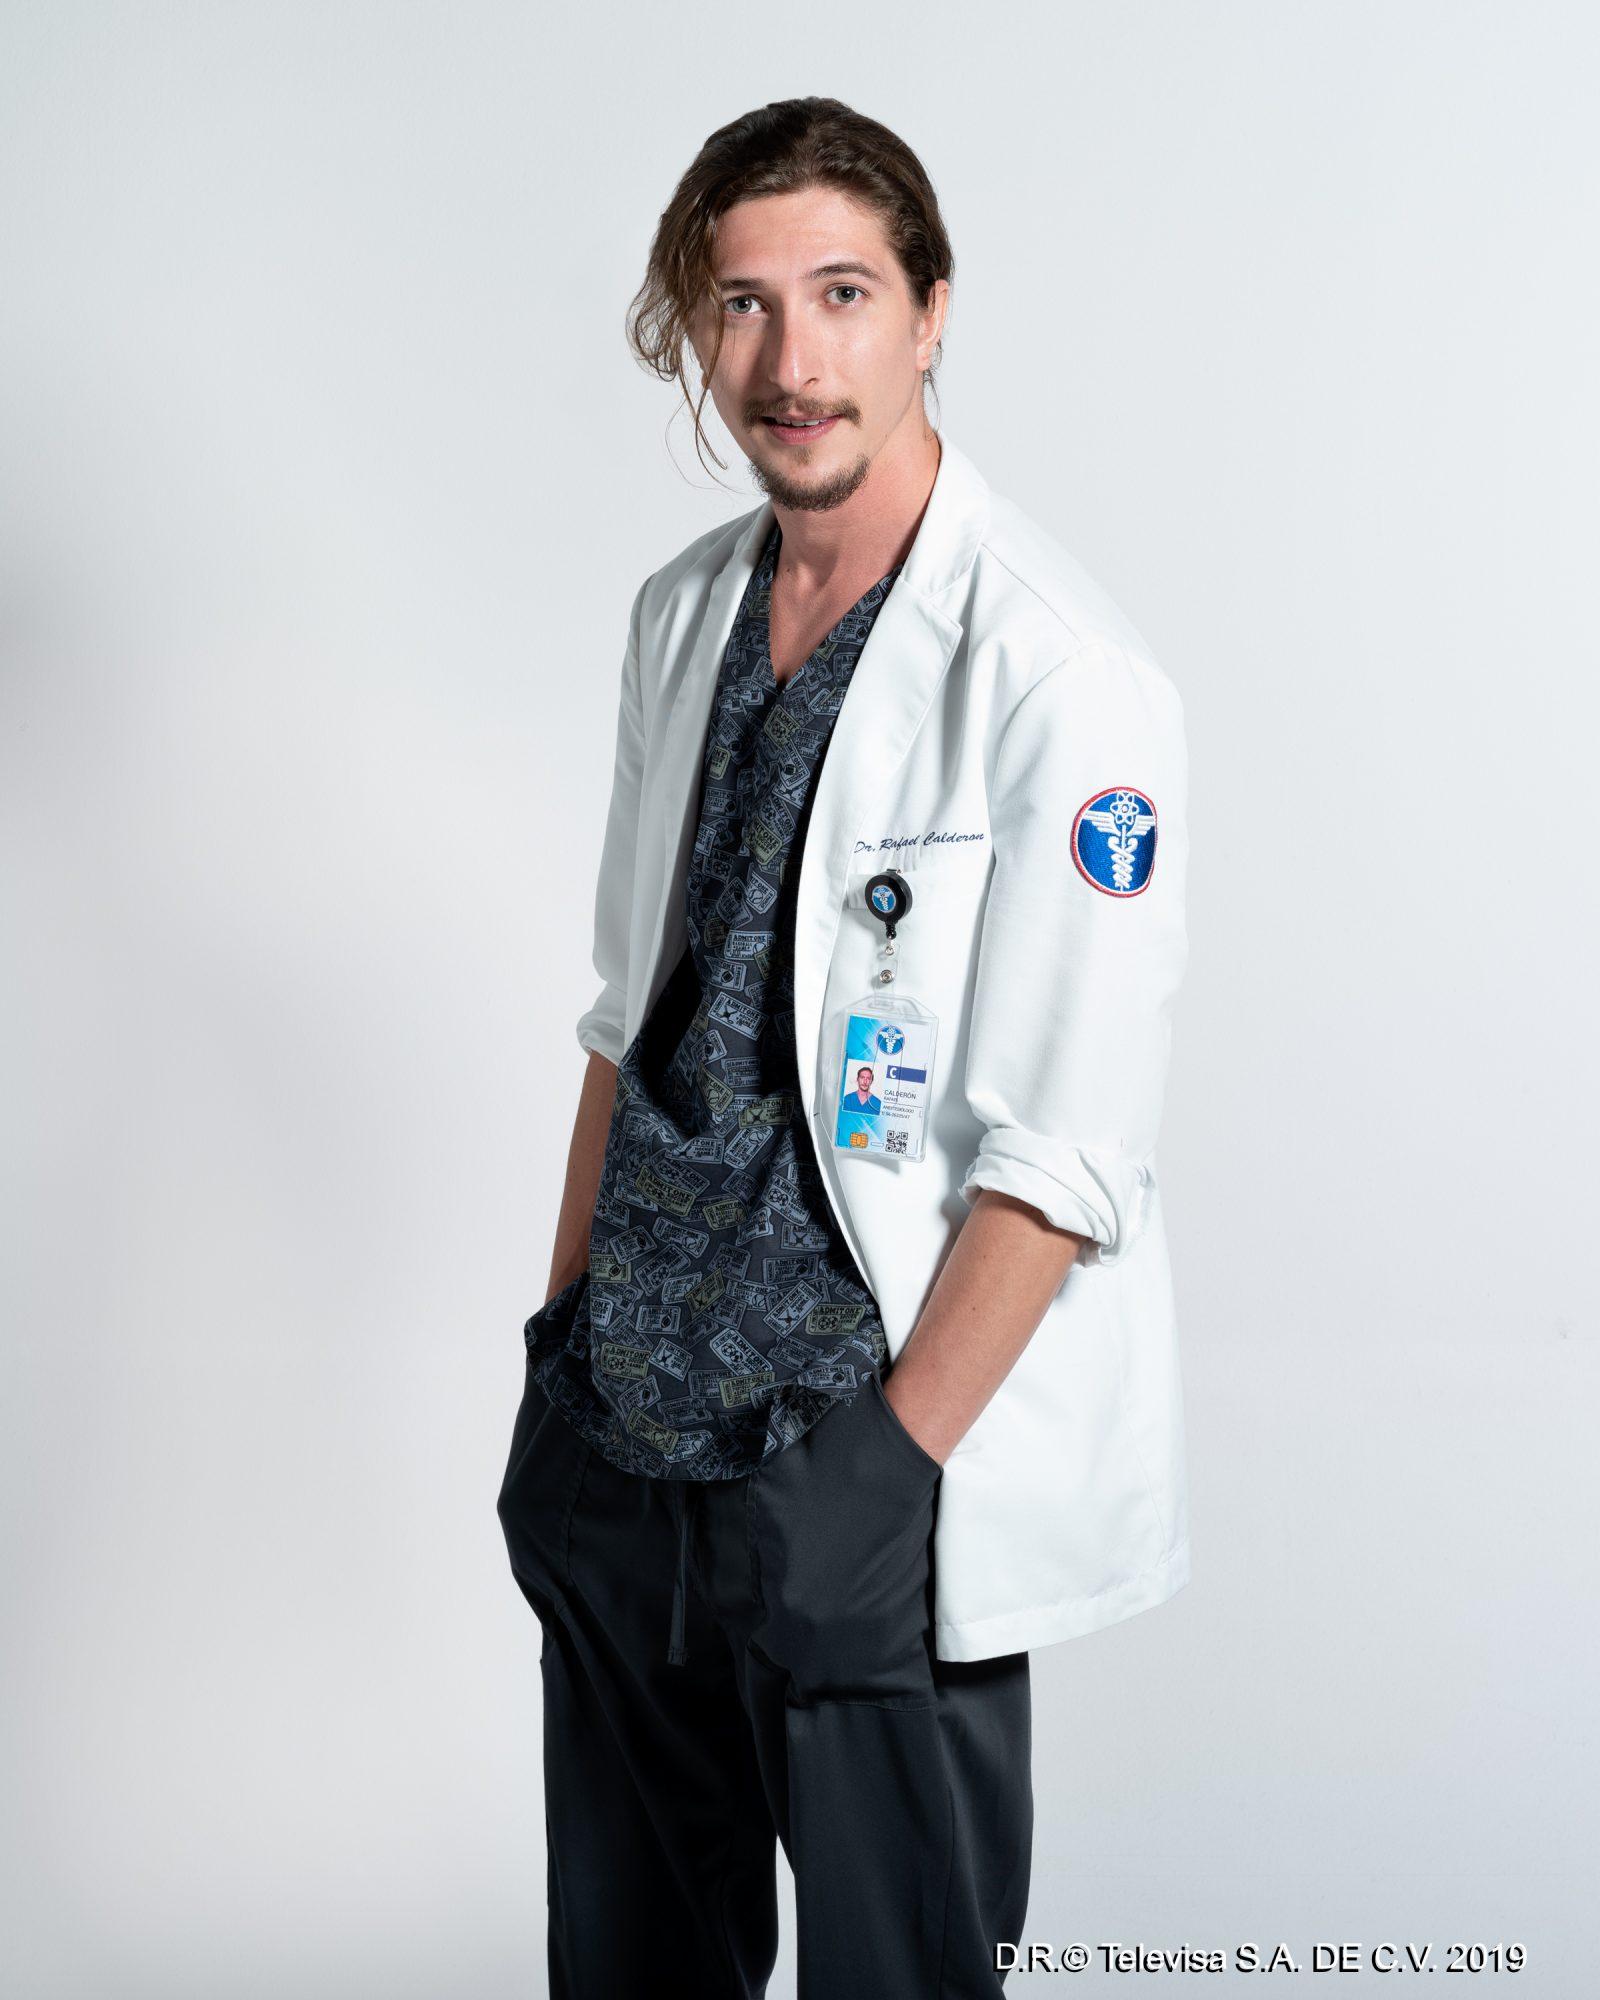 Federico Ayos